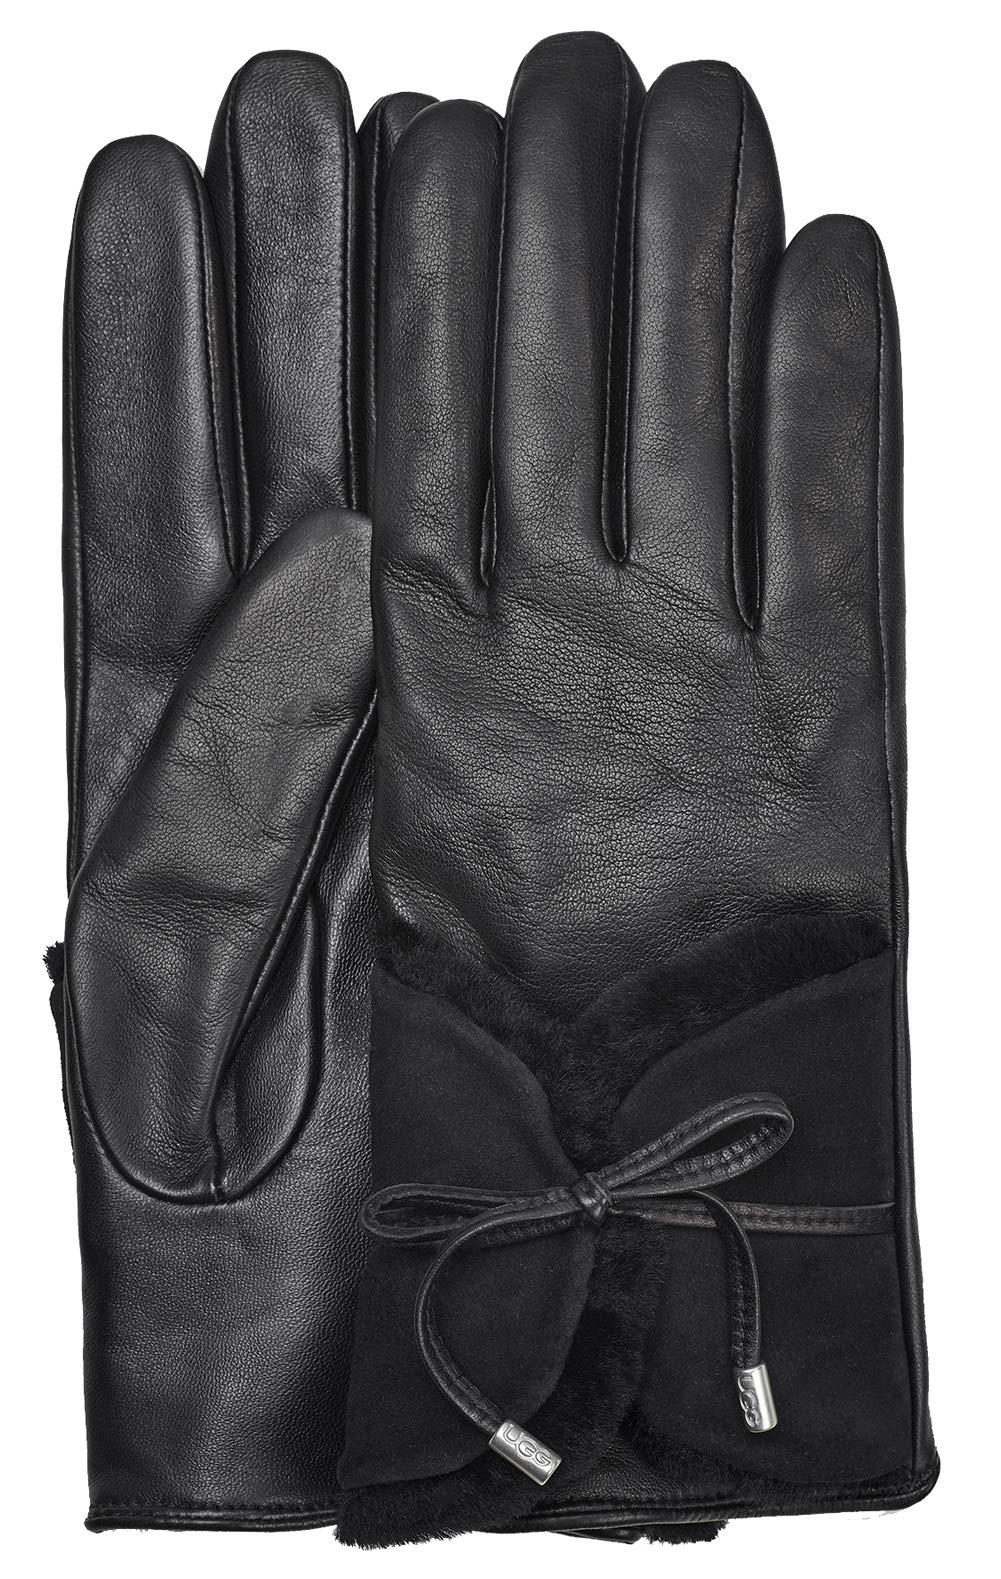 UGG Womens Combo Sheepskin Trim Glove, Black, Size Small